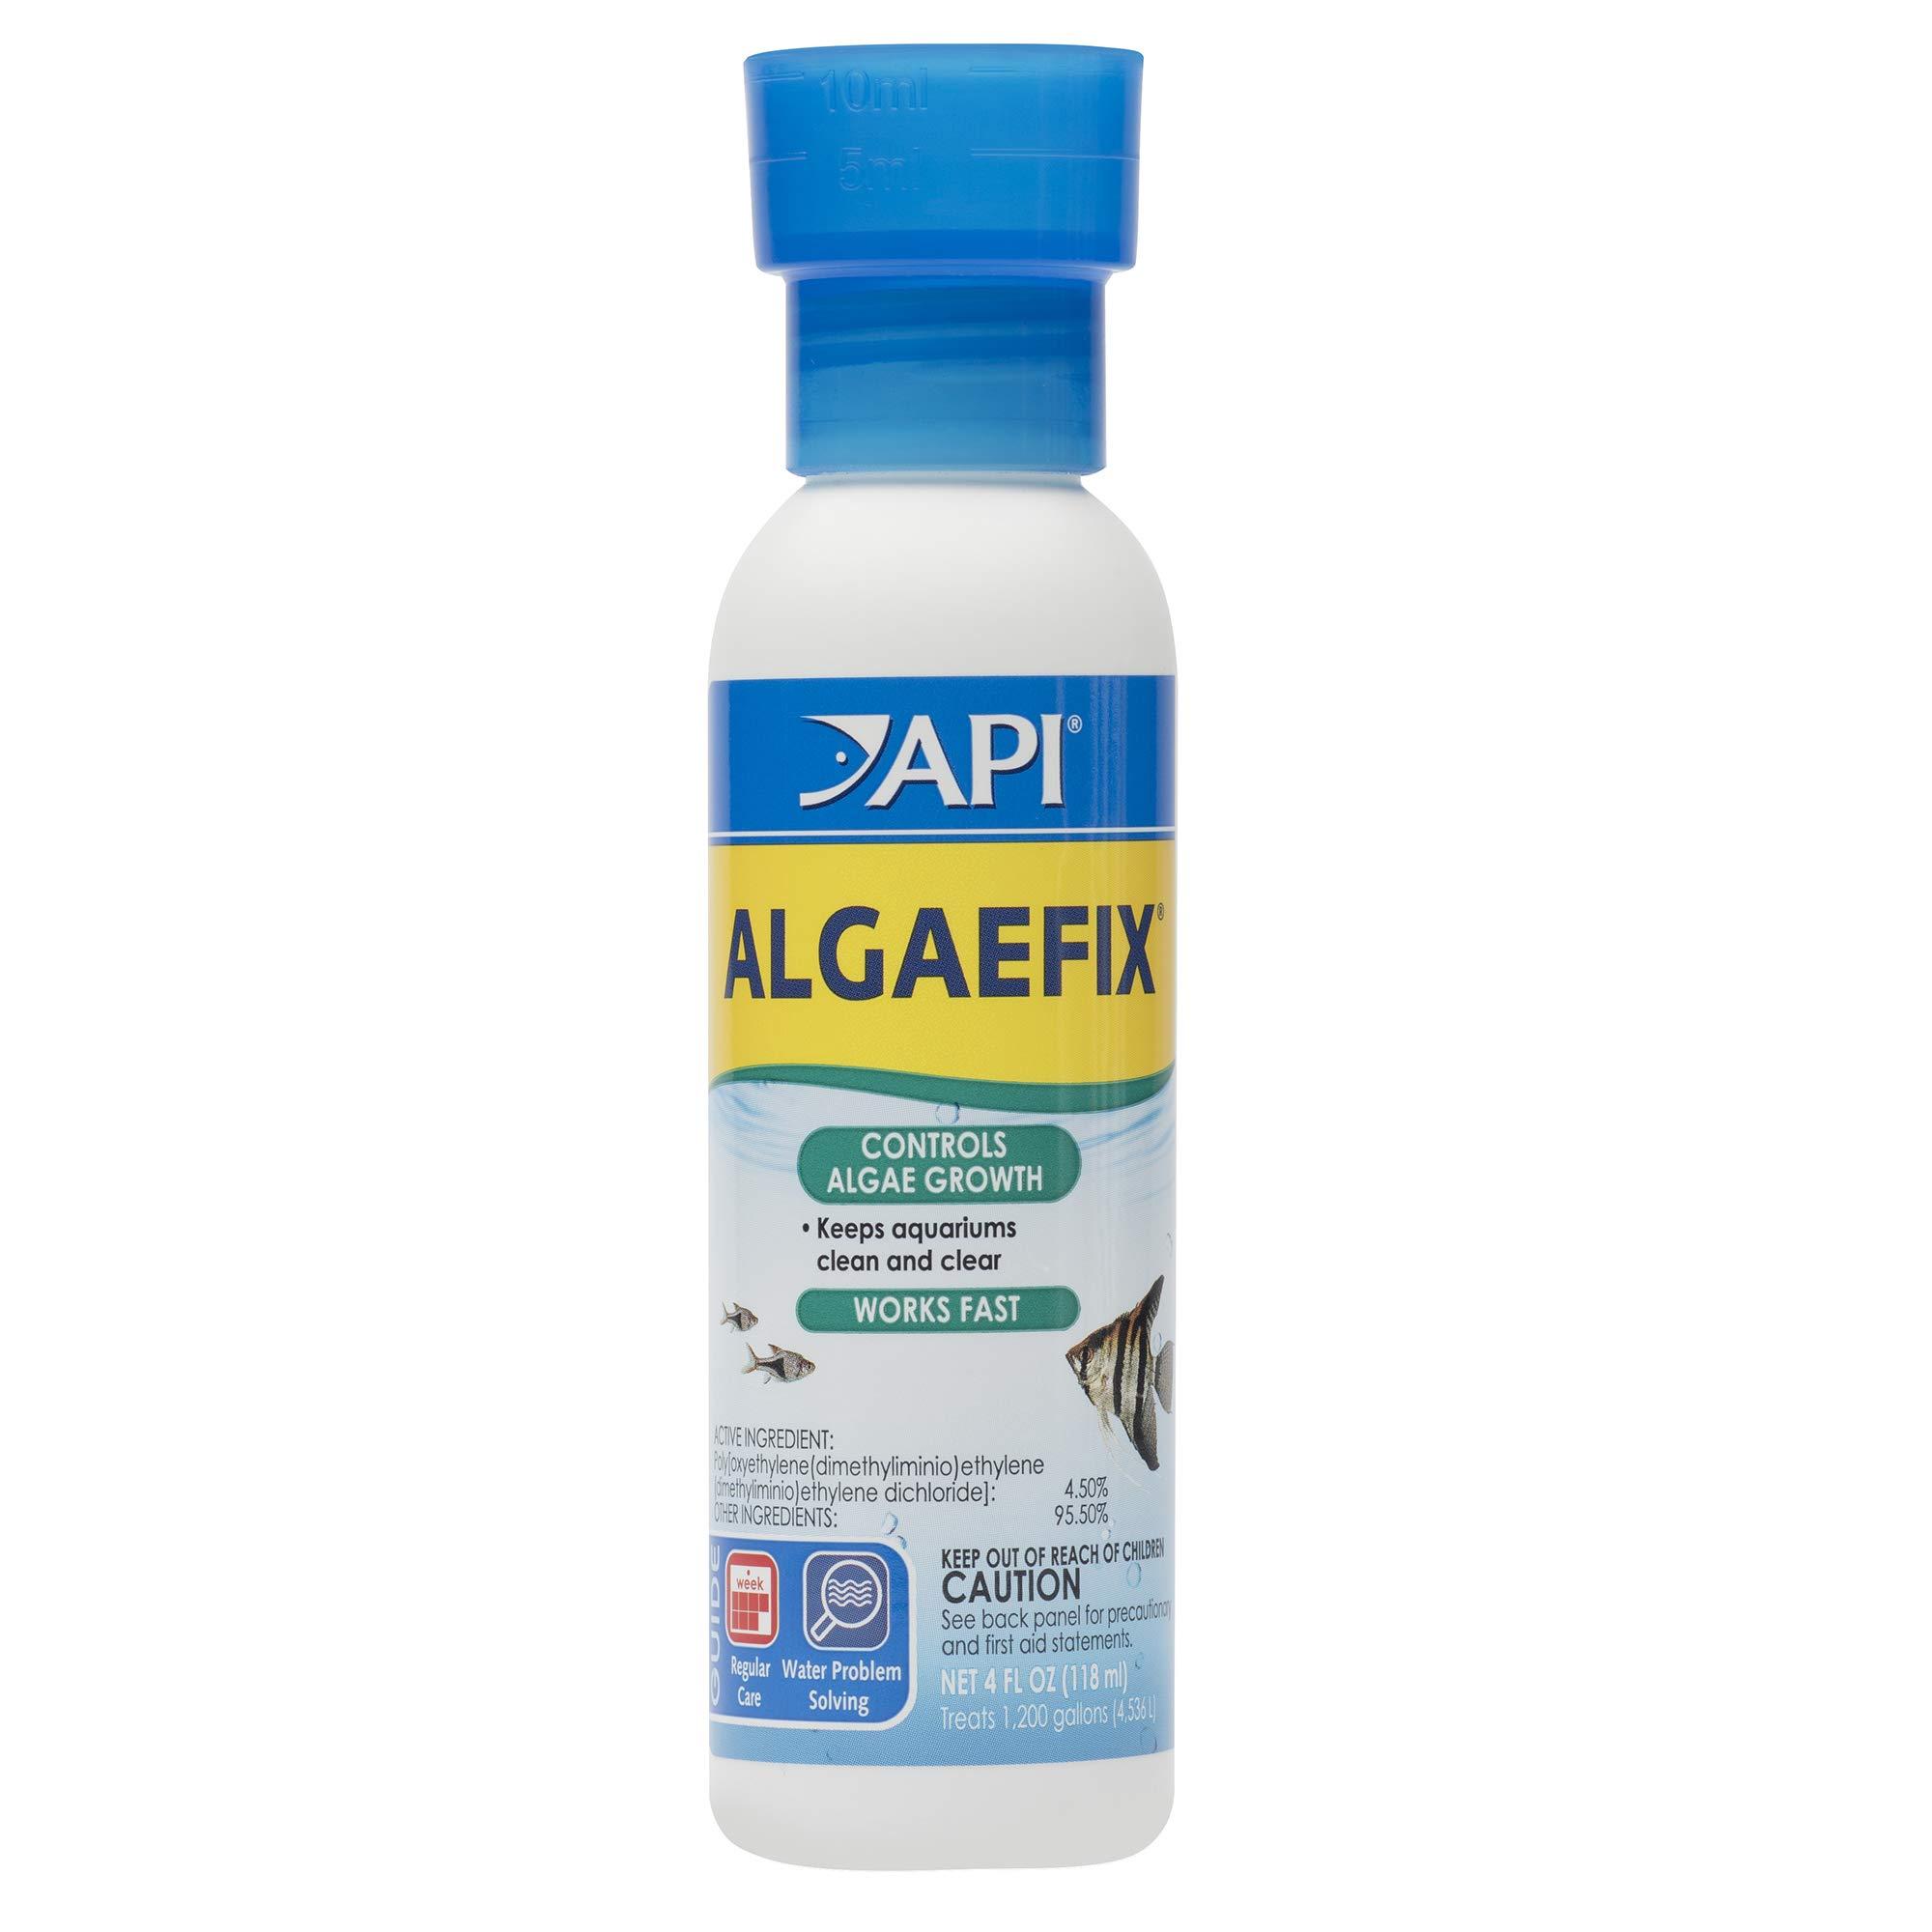 Amazon price history for API Algae Fix, 118 ml